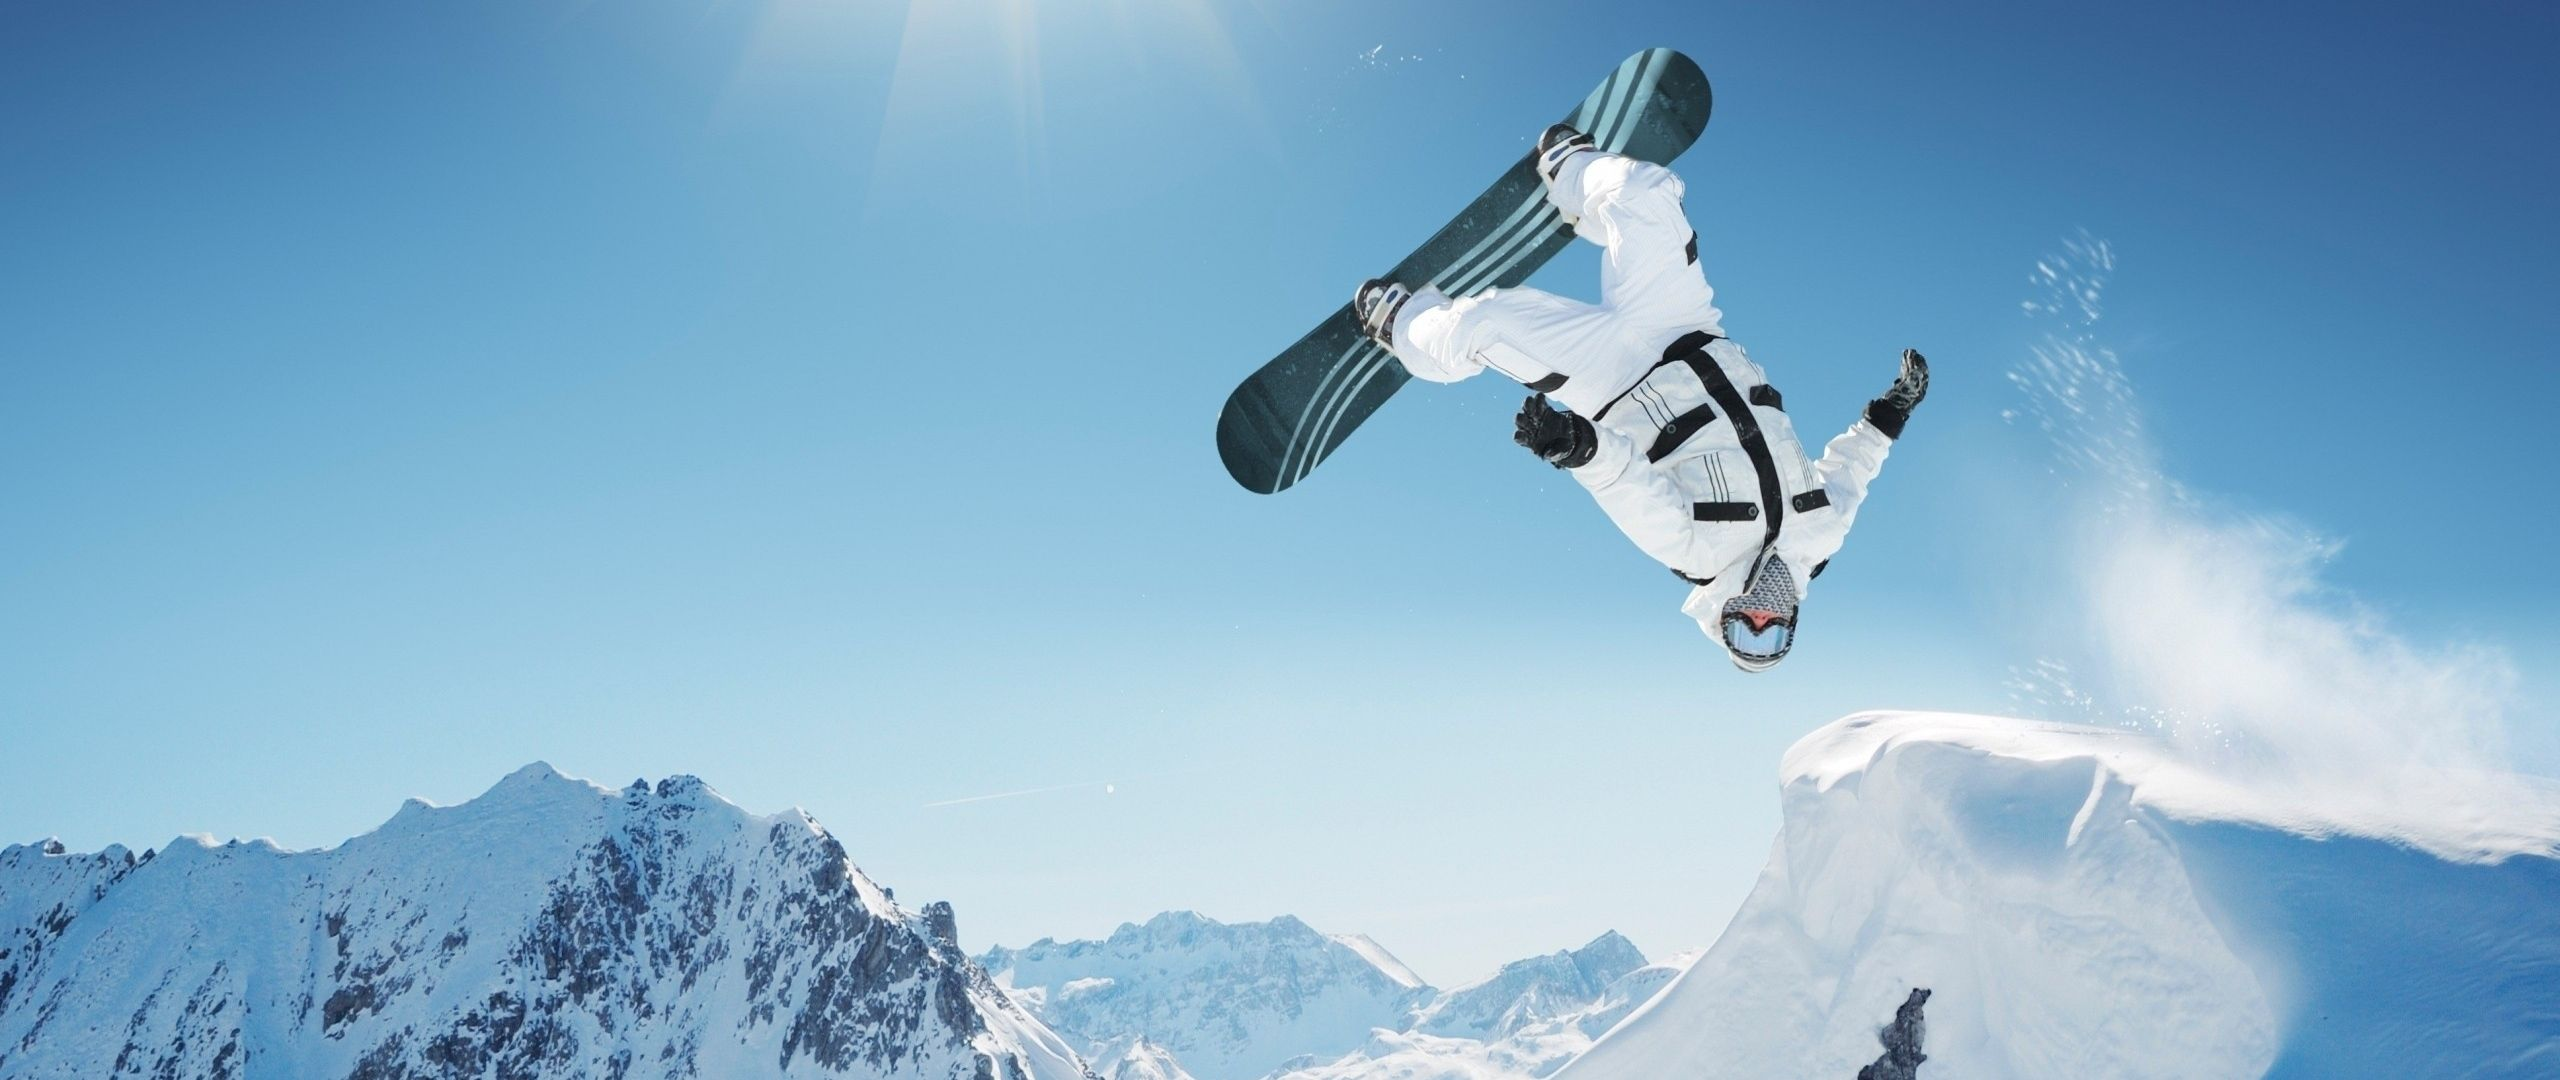 Download Wallpaper 2560x1080 Snowboarding, Trick, Jump